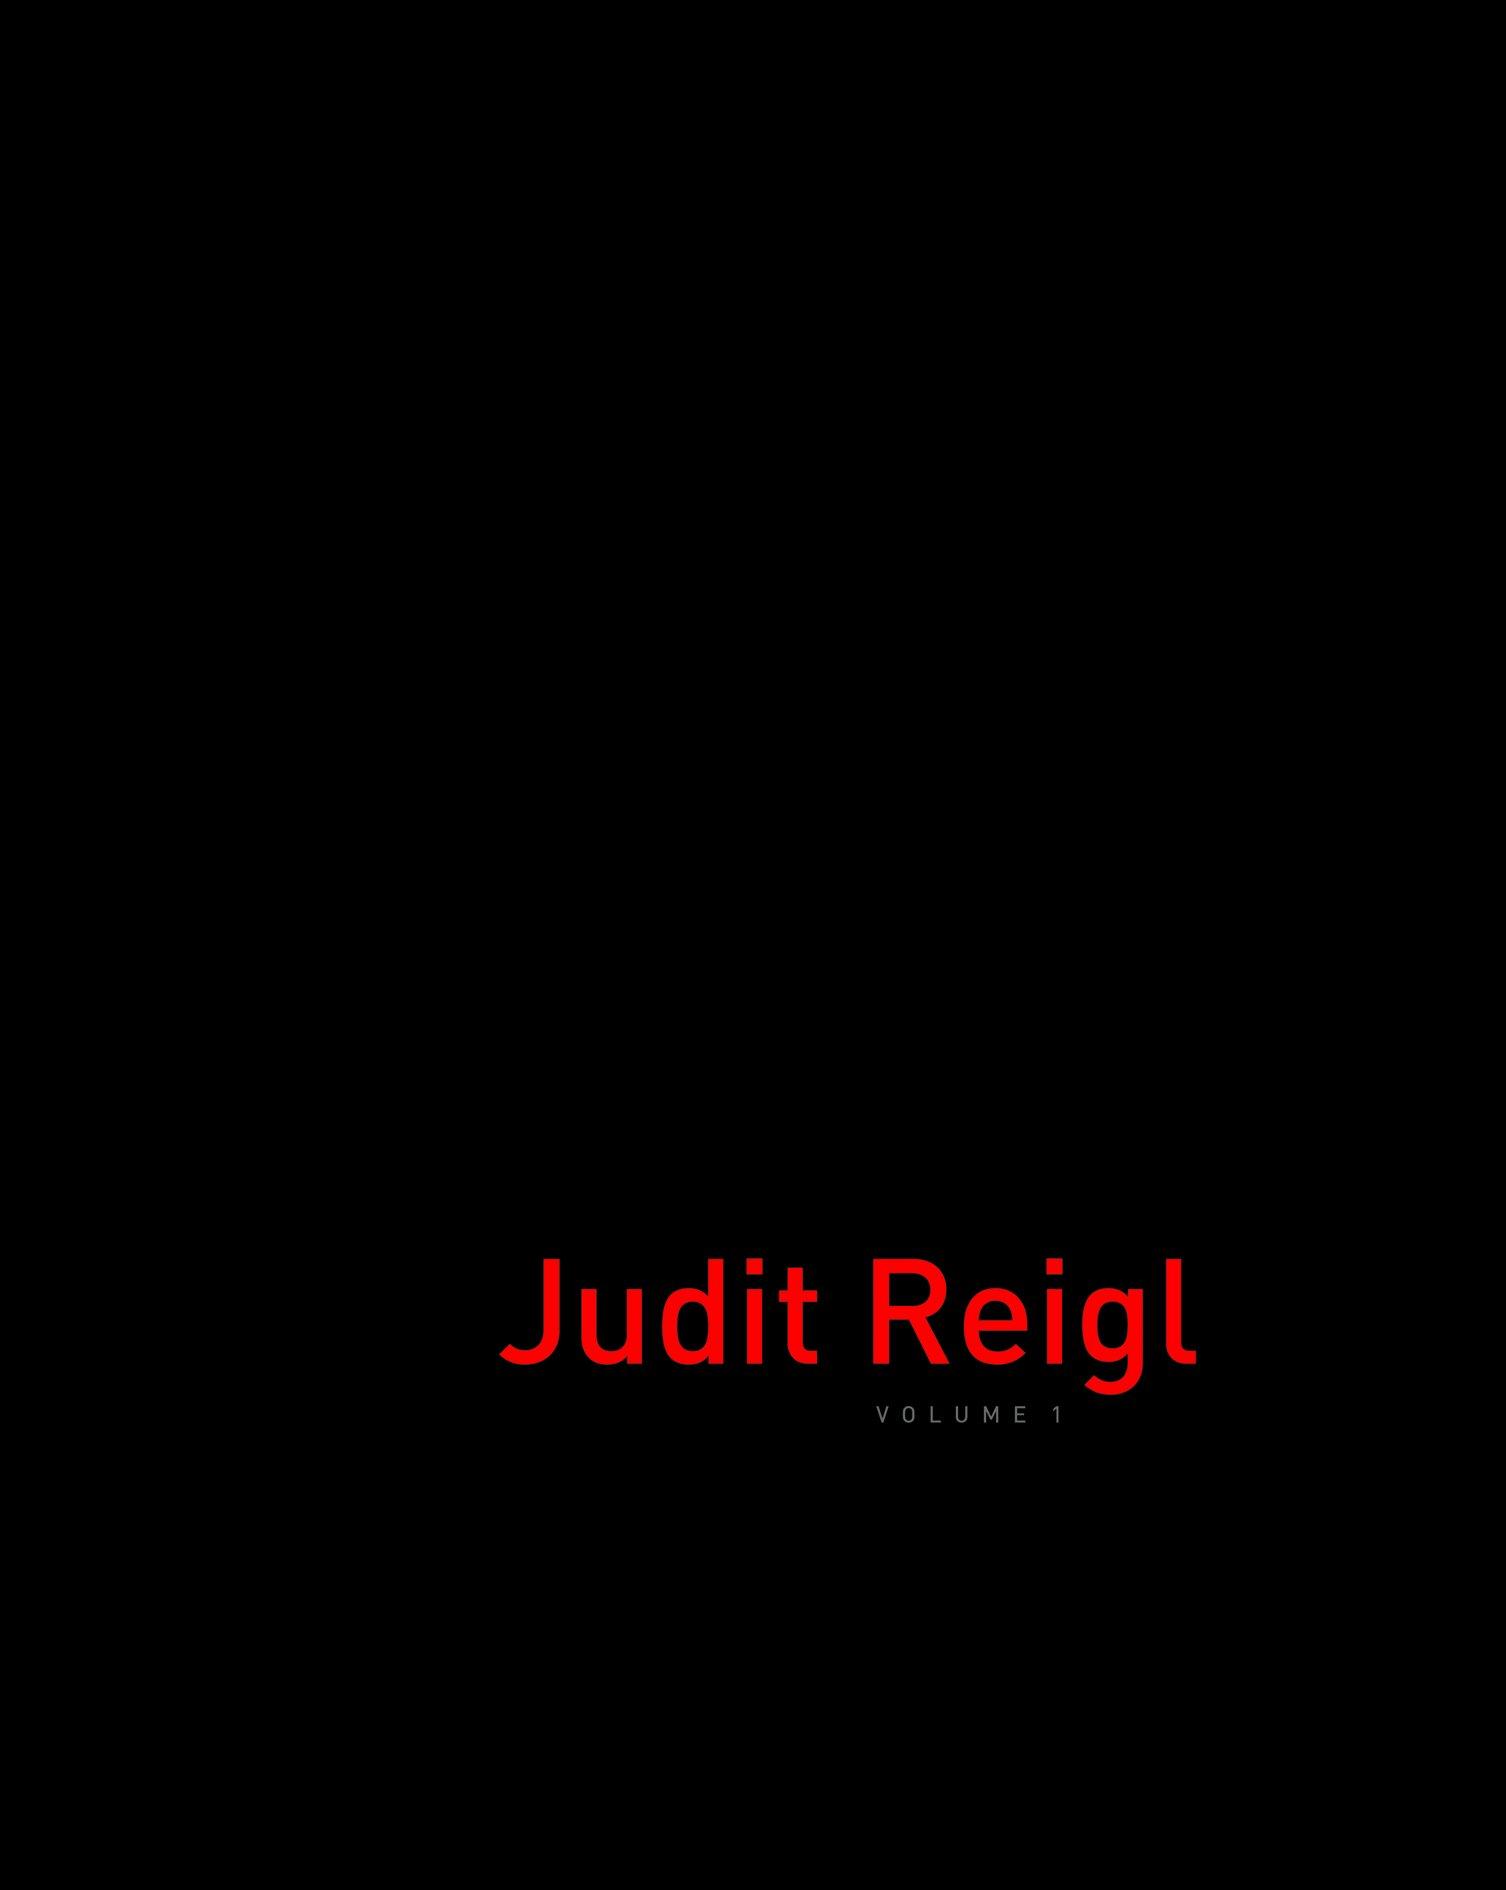 Judit Reigl Volume 1. Agnes Berecz